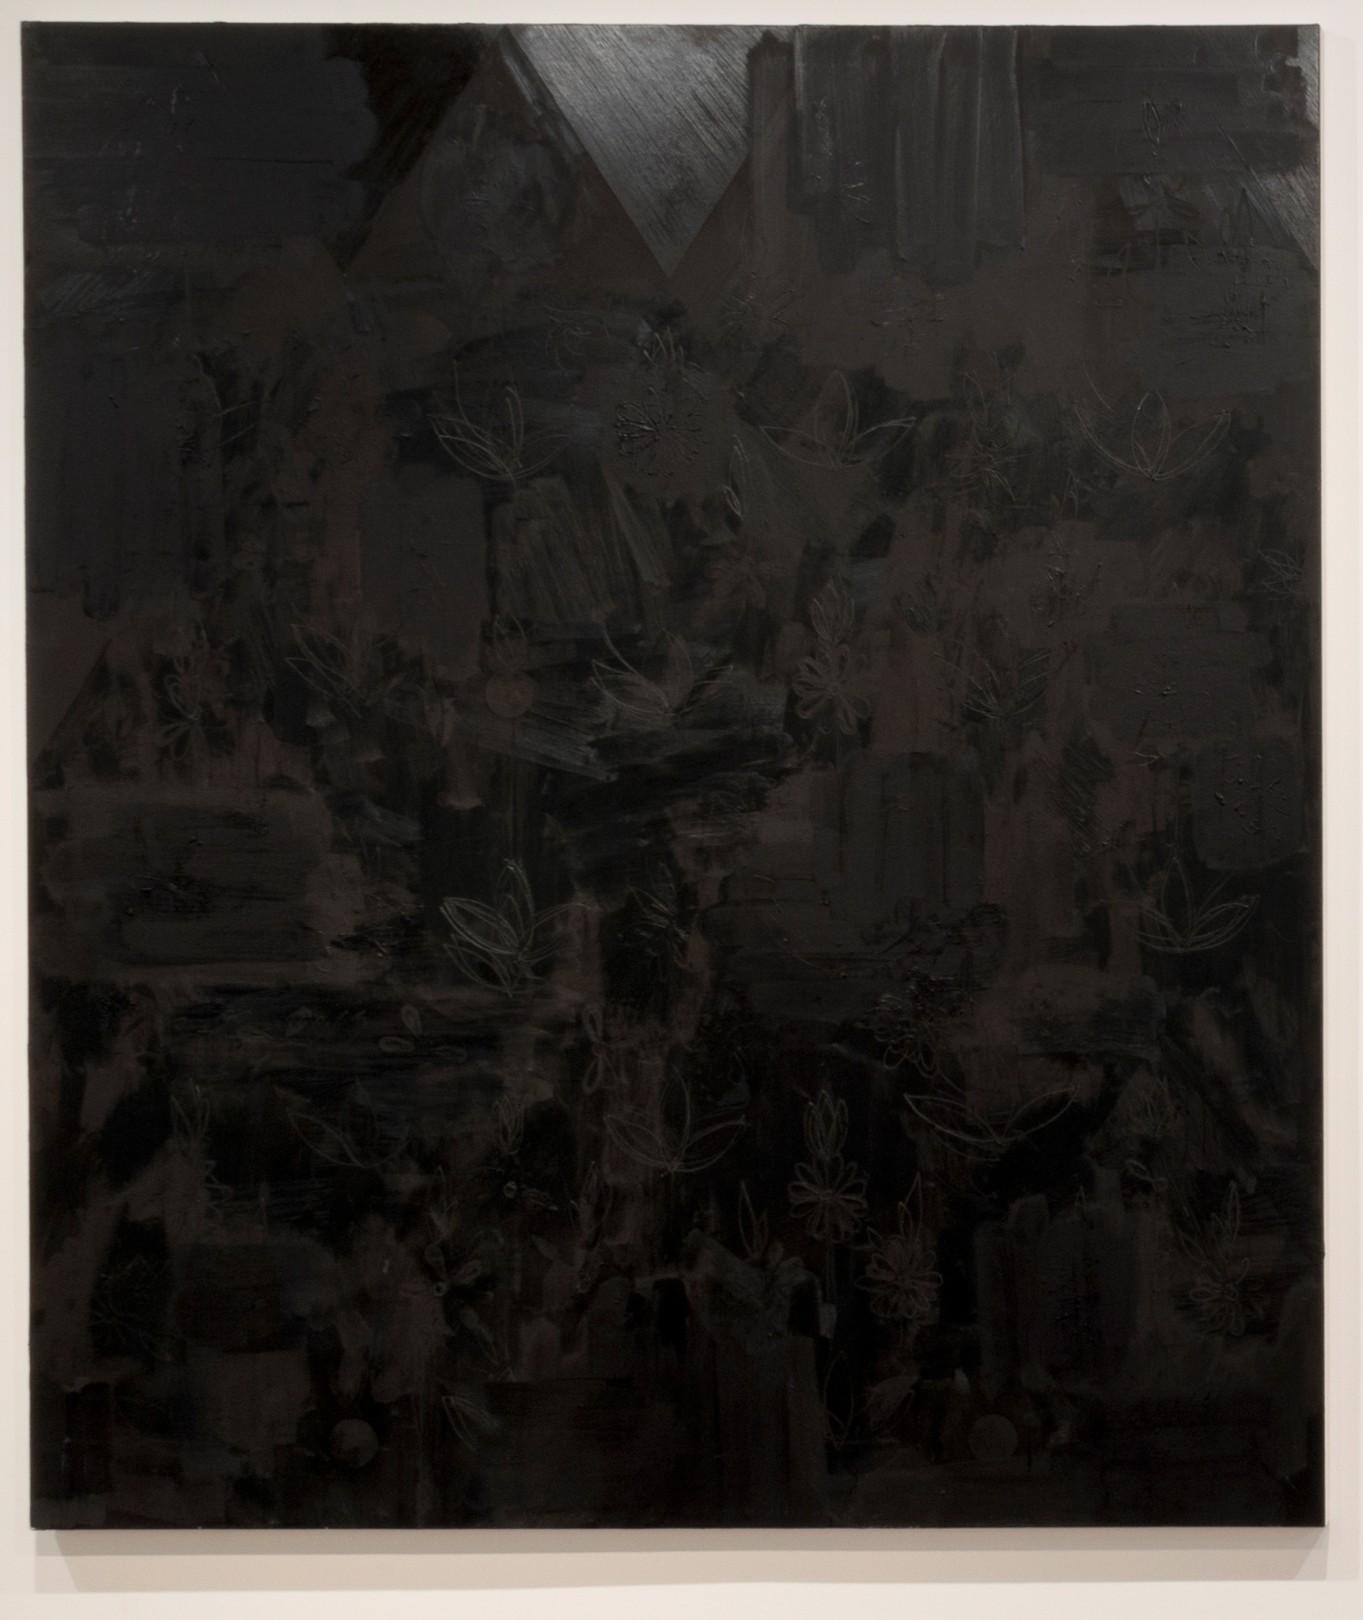 Kamrooz Aram, Untitled (Palimpsest #20), 2013